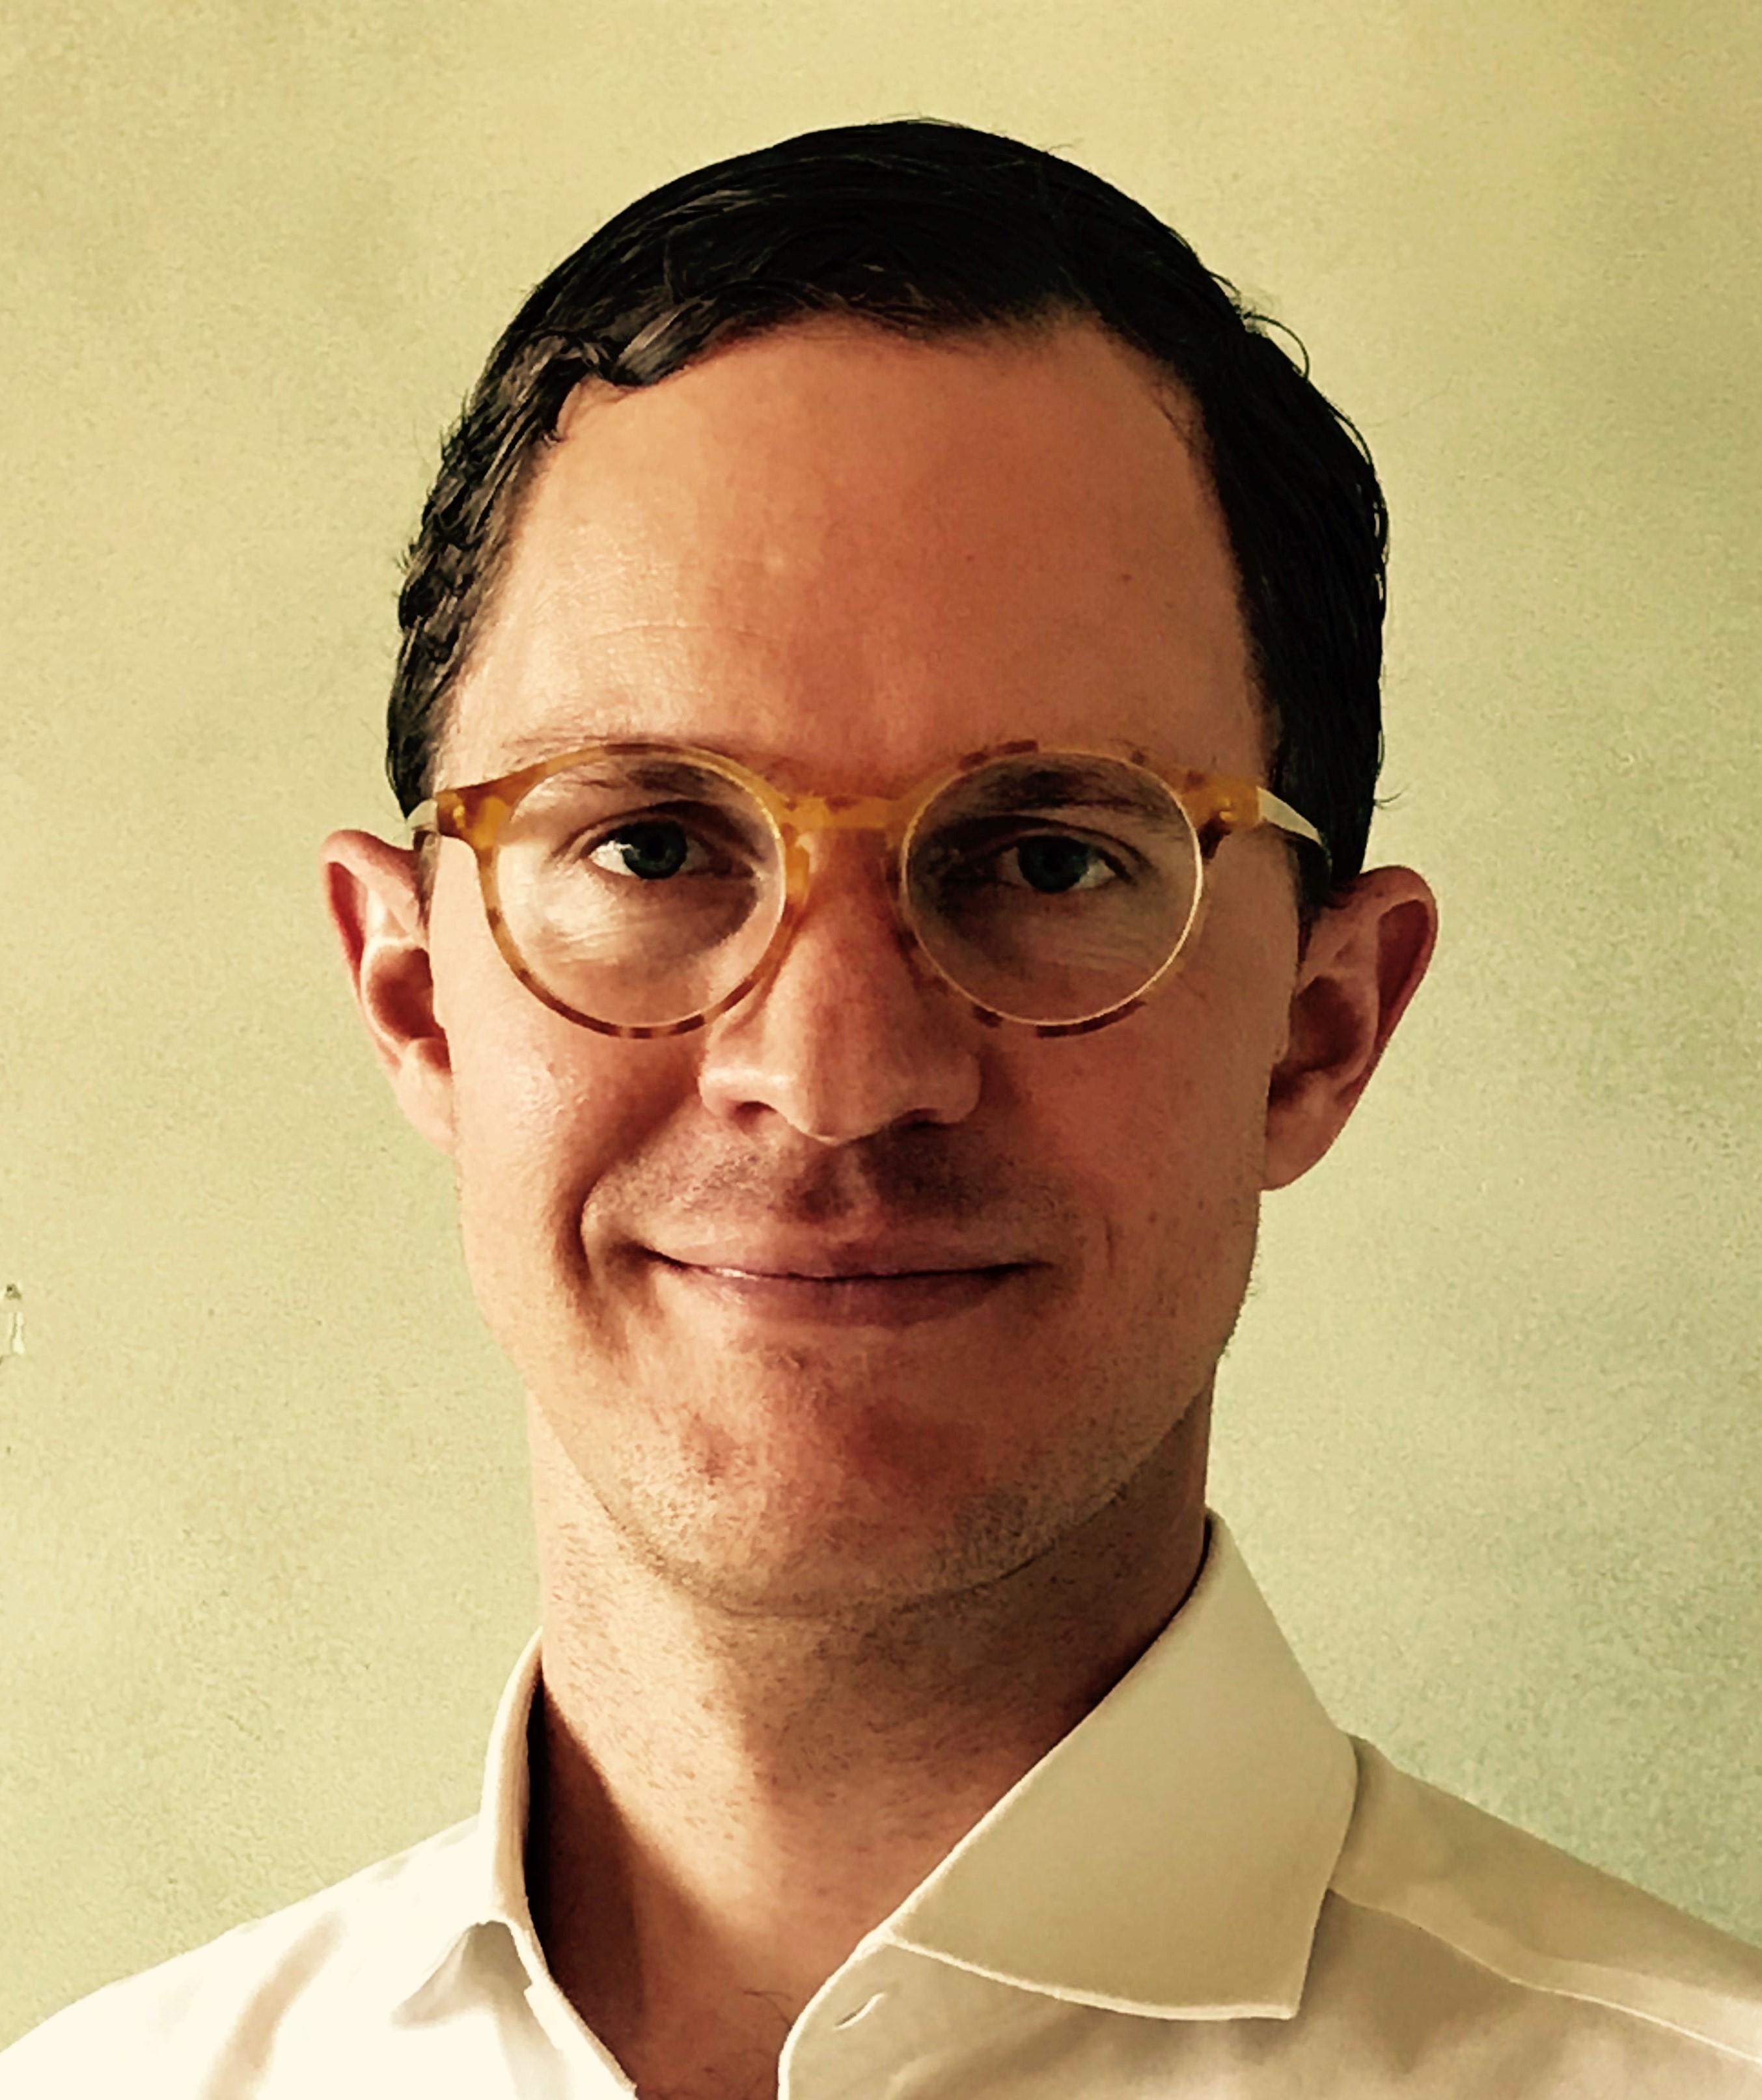 Jeffrey Christiansen